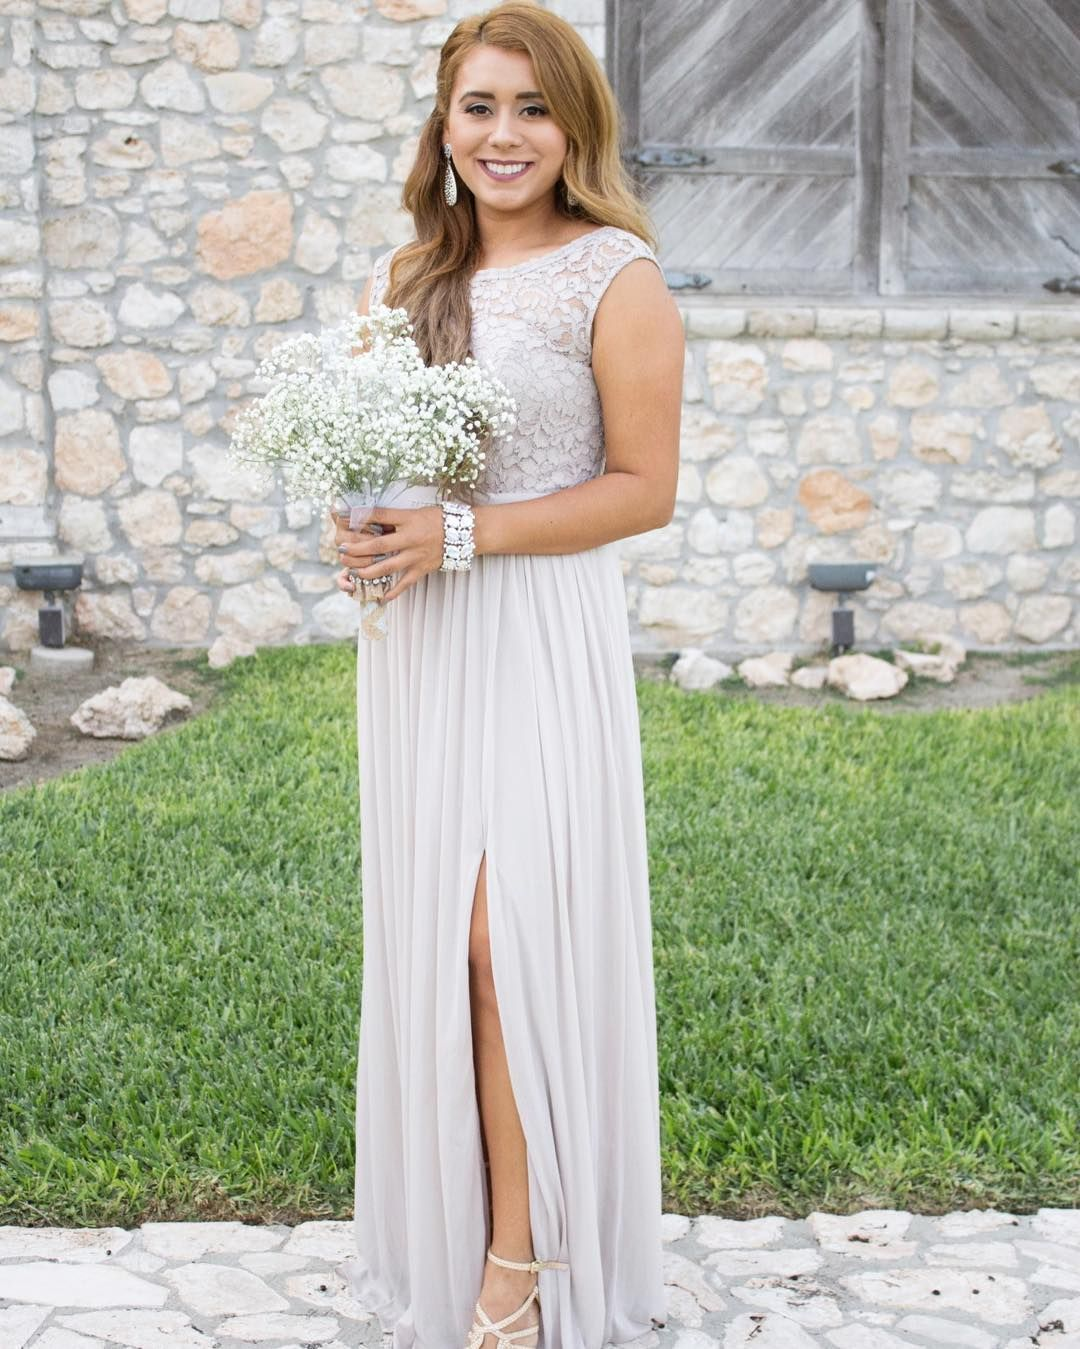 Lace bodice high neck taupe David\'s Bridal bridesmaid dress | Photo ...